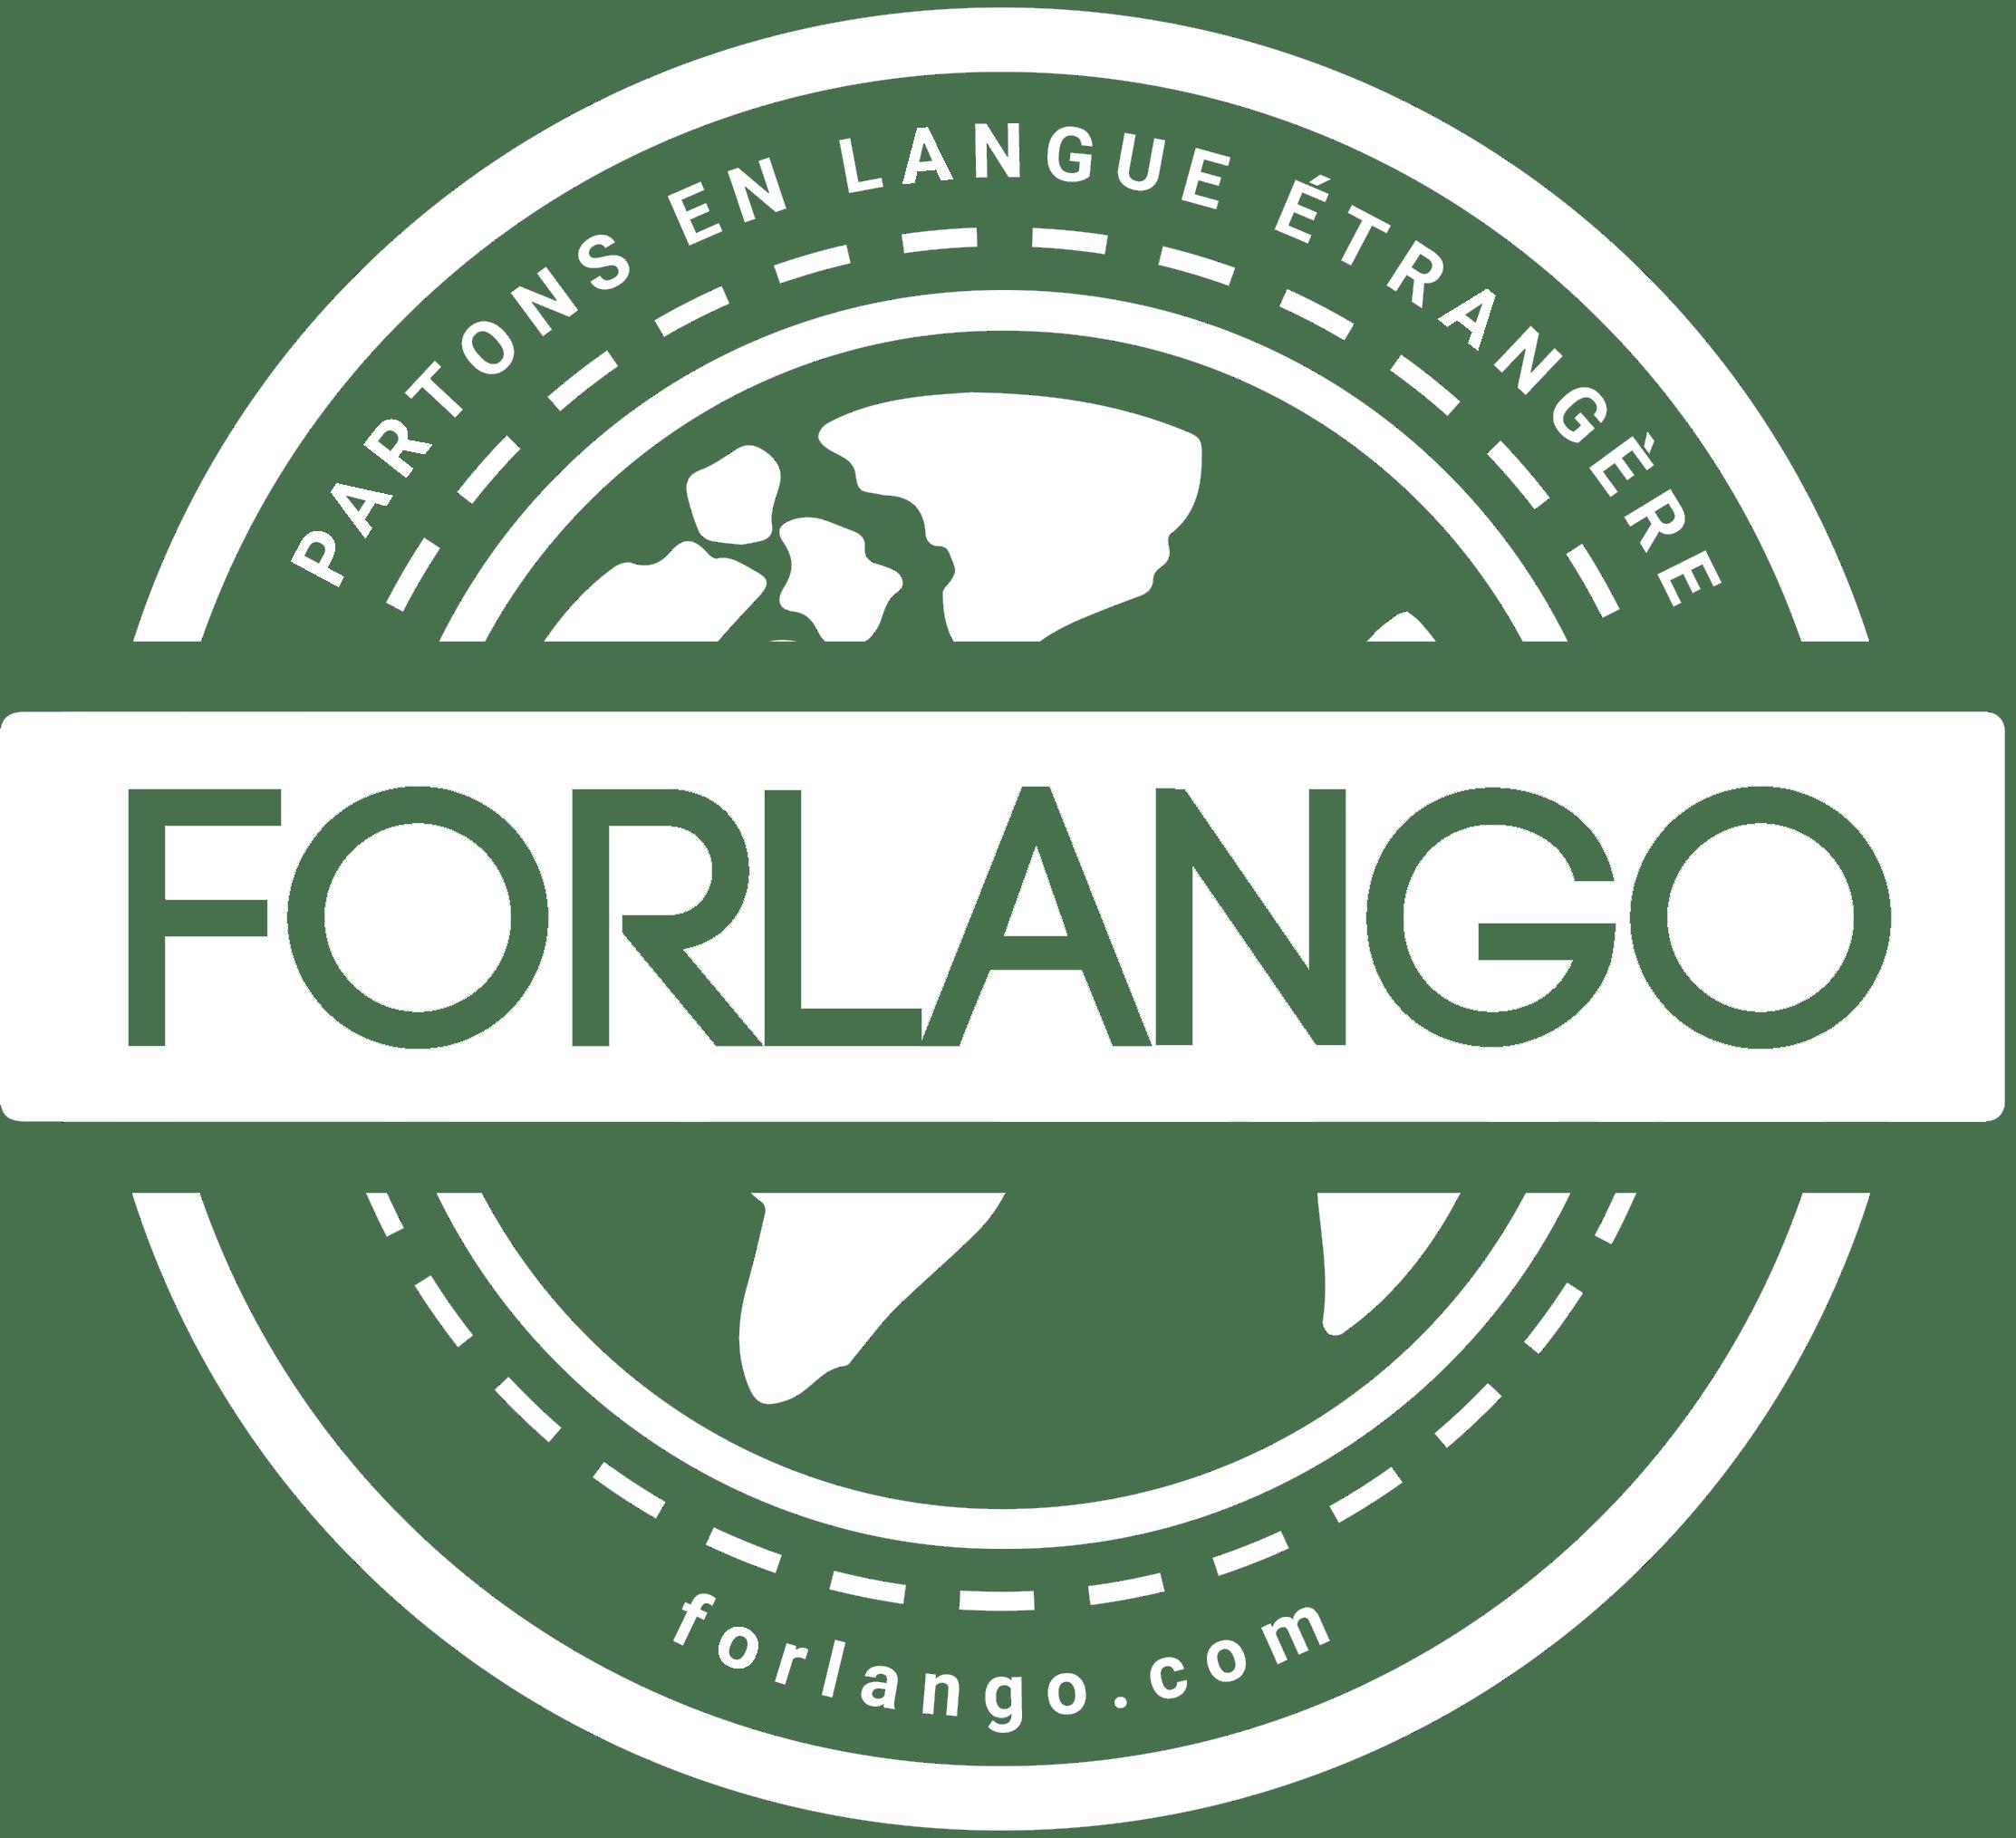 Forlango